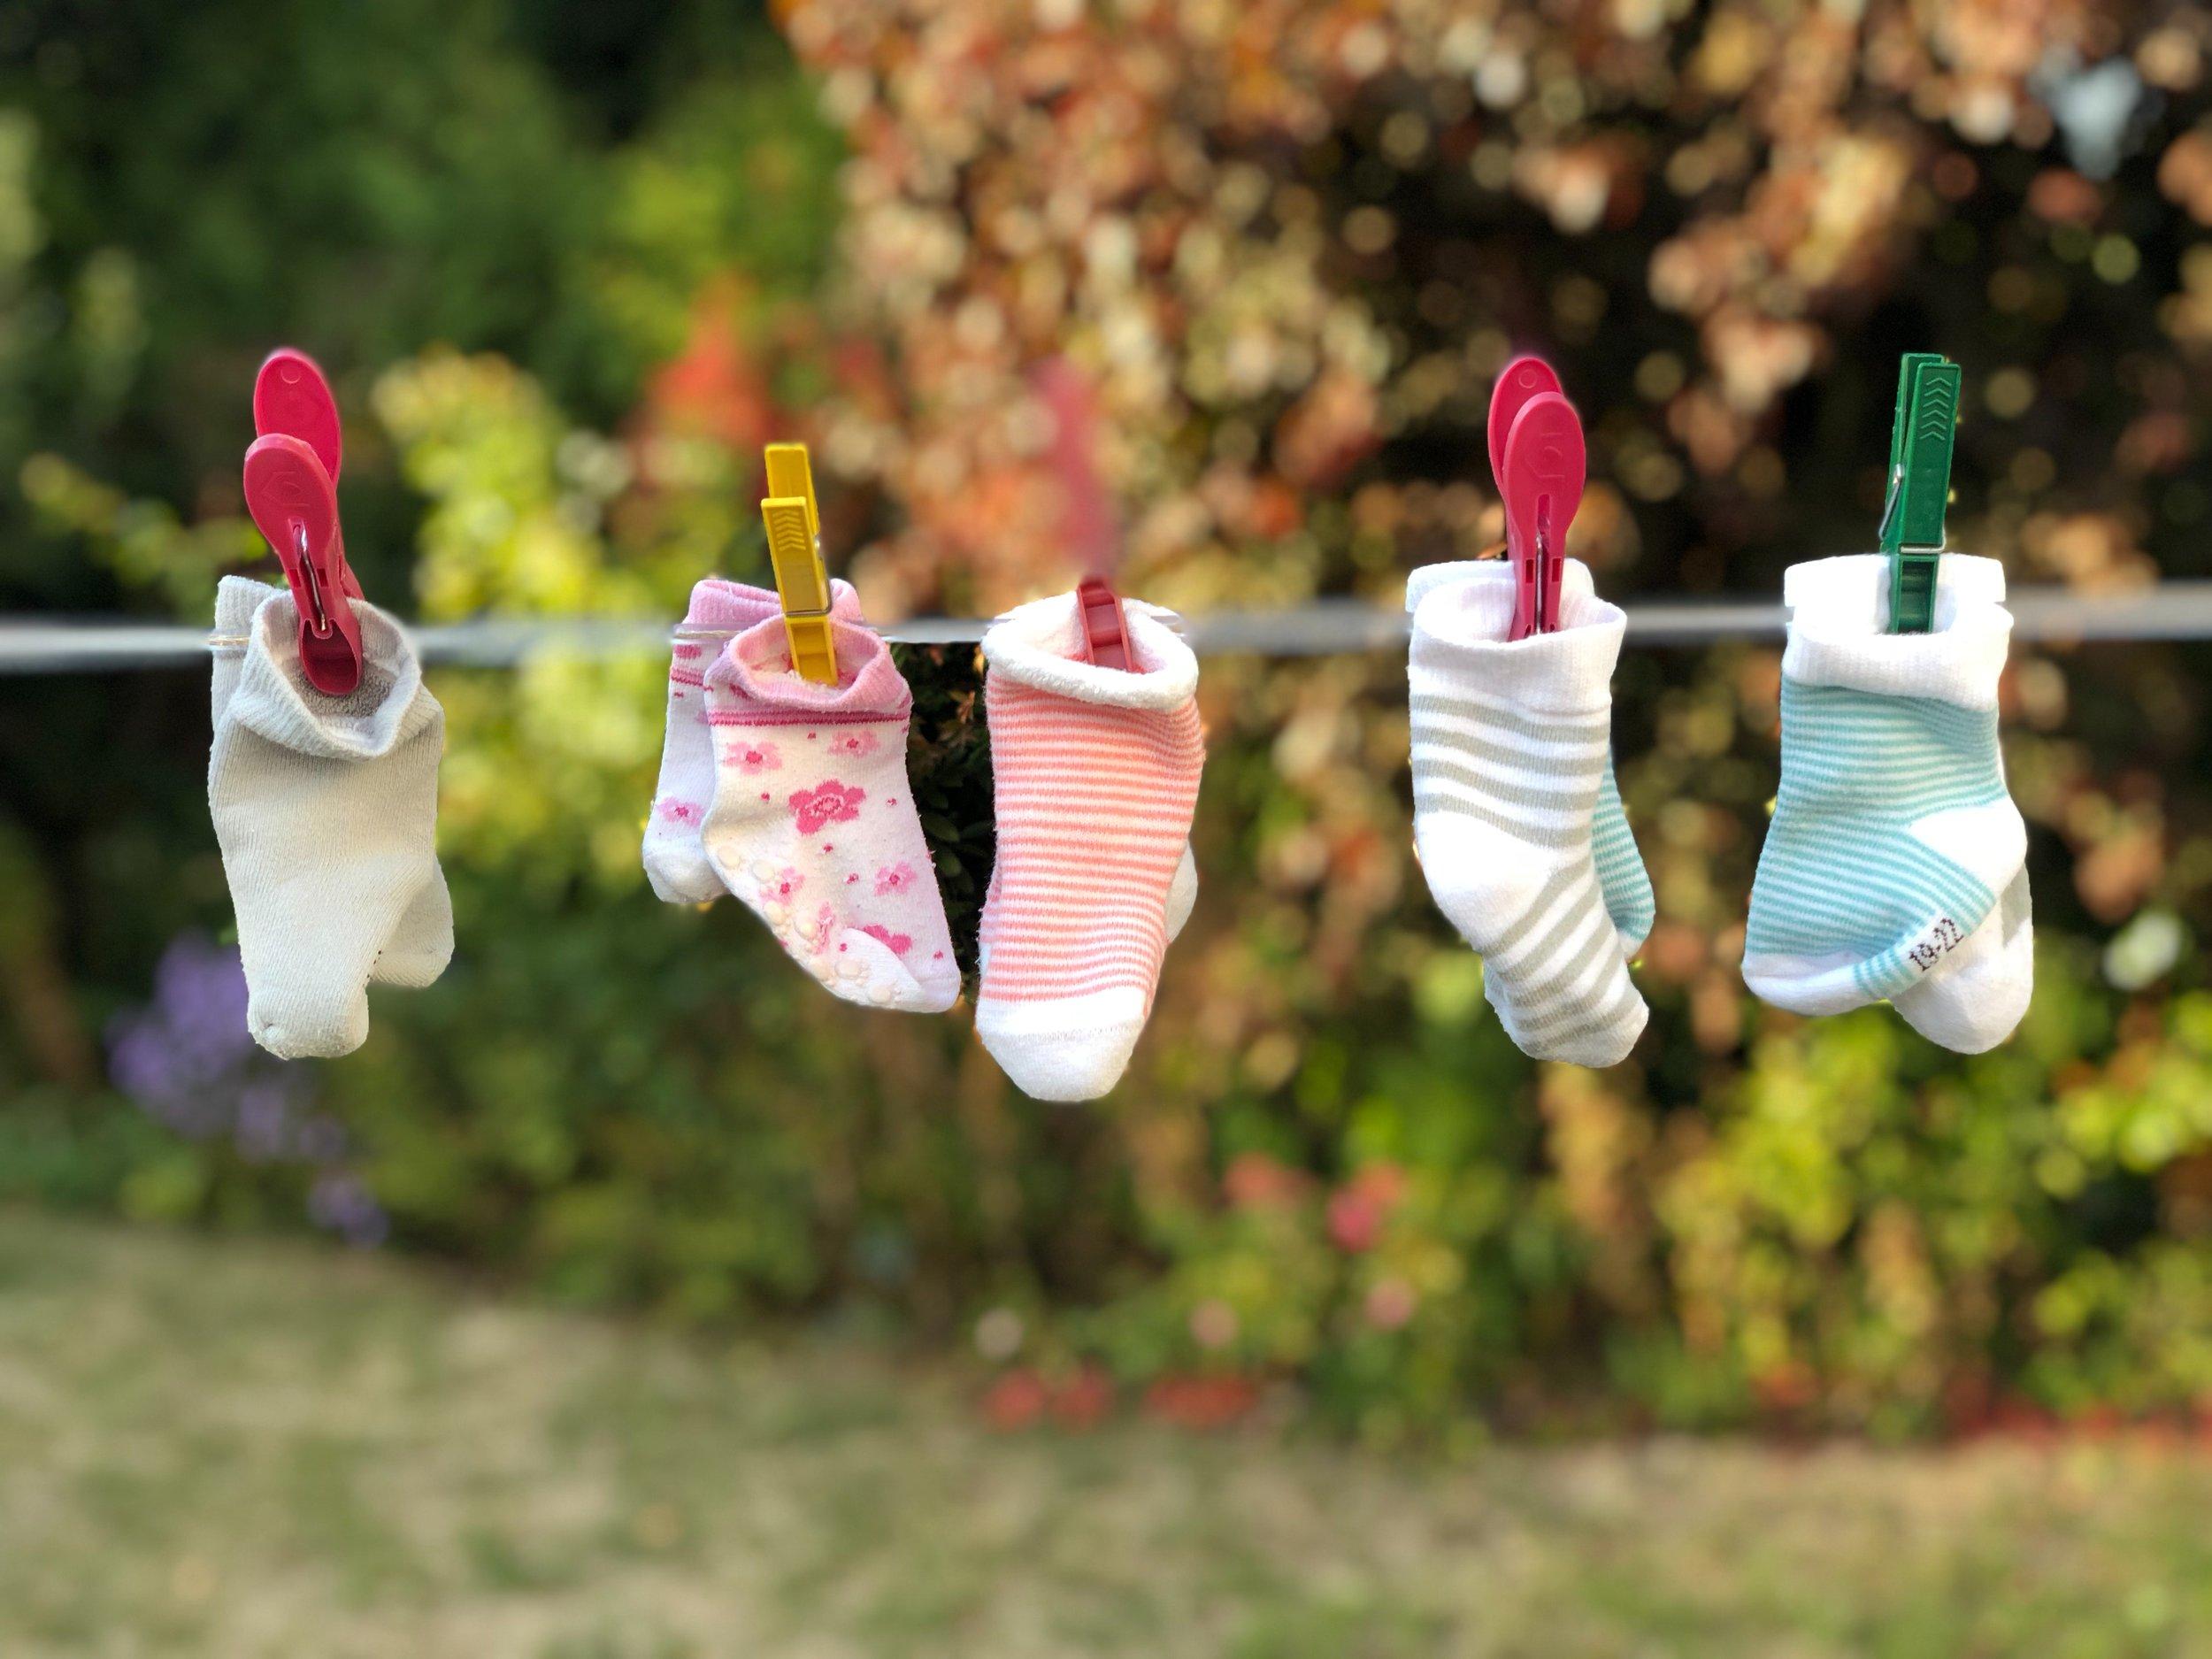 Go home with lost socks! Photo credit: Christian Fickinger on unsplash